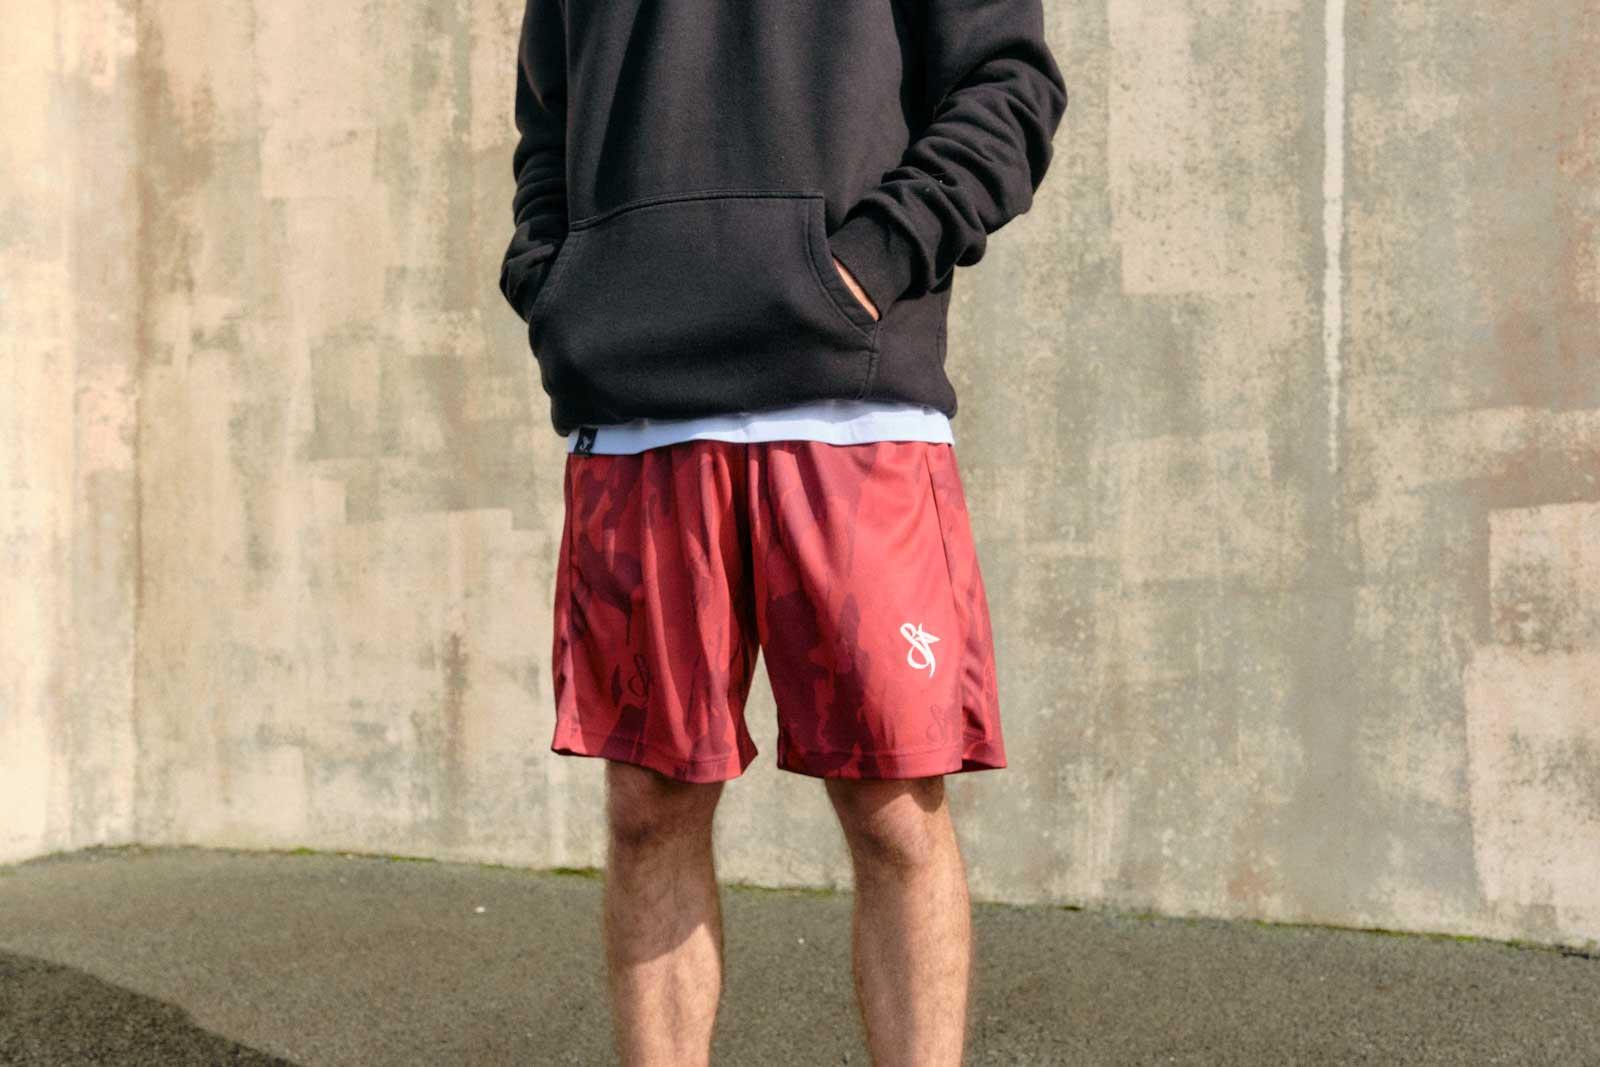 mono red camo basketball short model horizontal